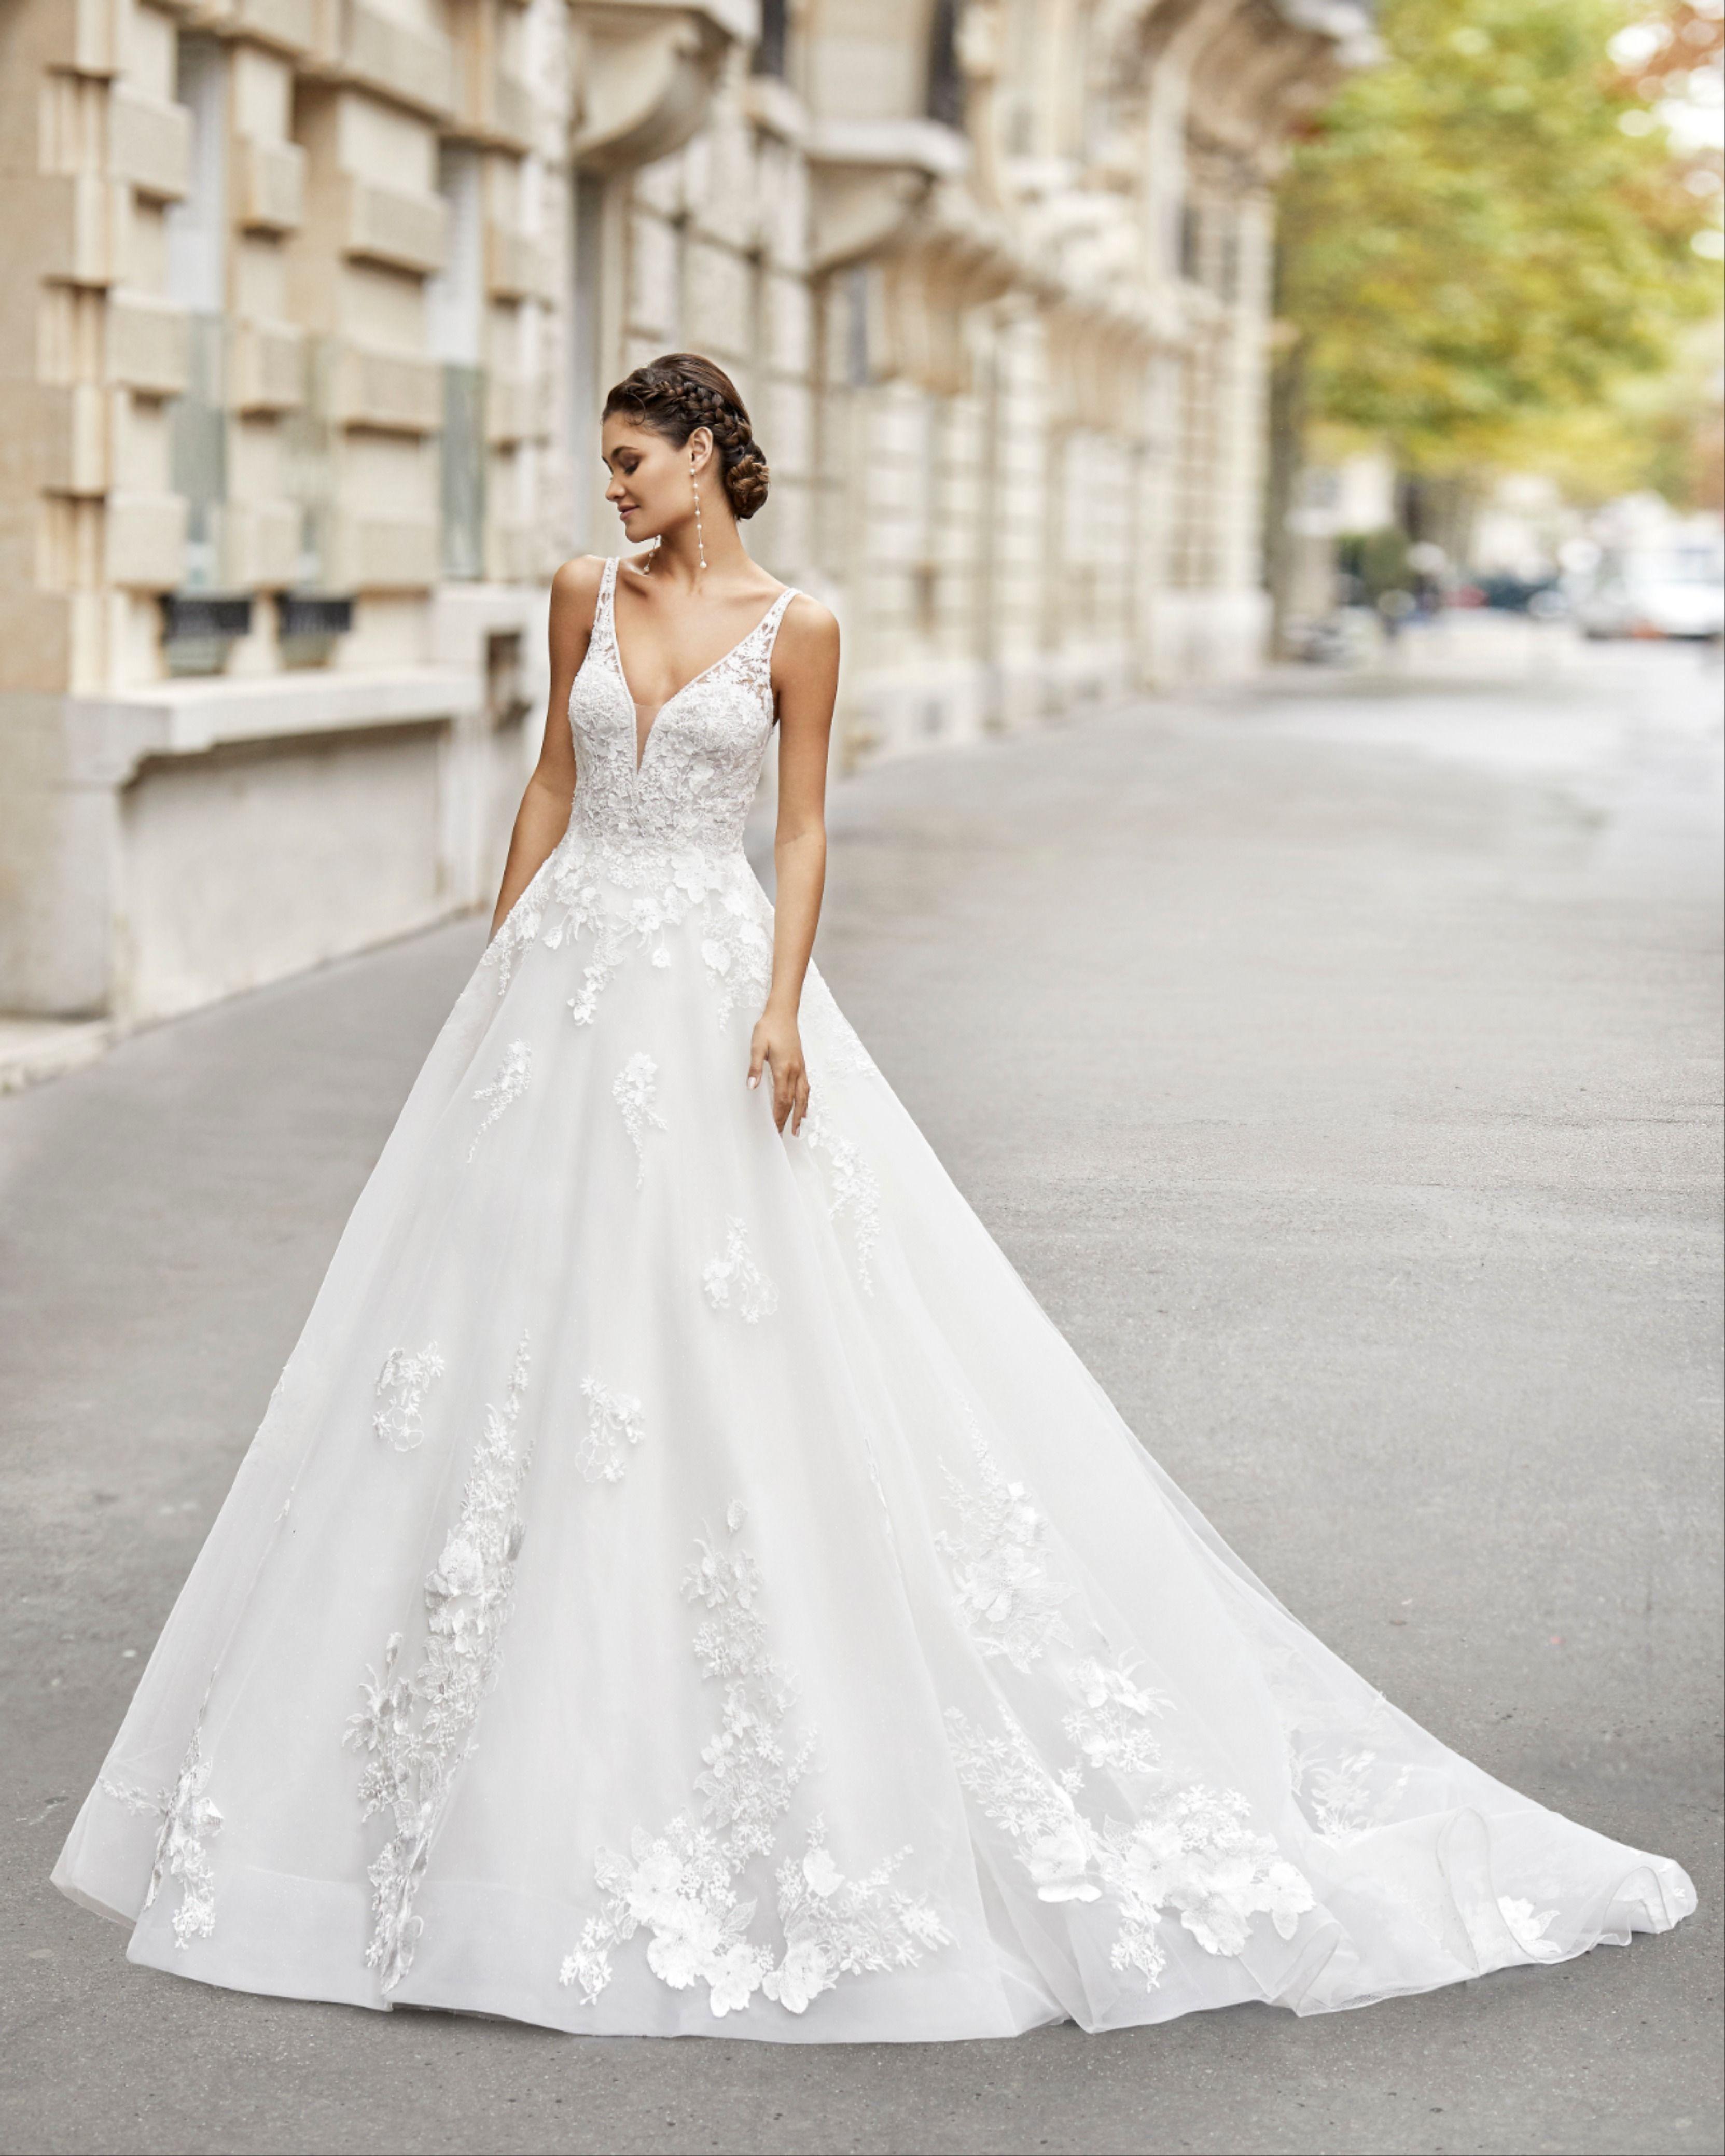 Termal By Rosa Clara Wedding Dresses Princess Style Wedding Dresses Wedding Dresses Photos [ 4157 x 3326 Pixel ]